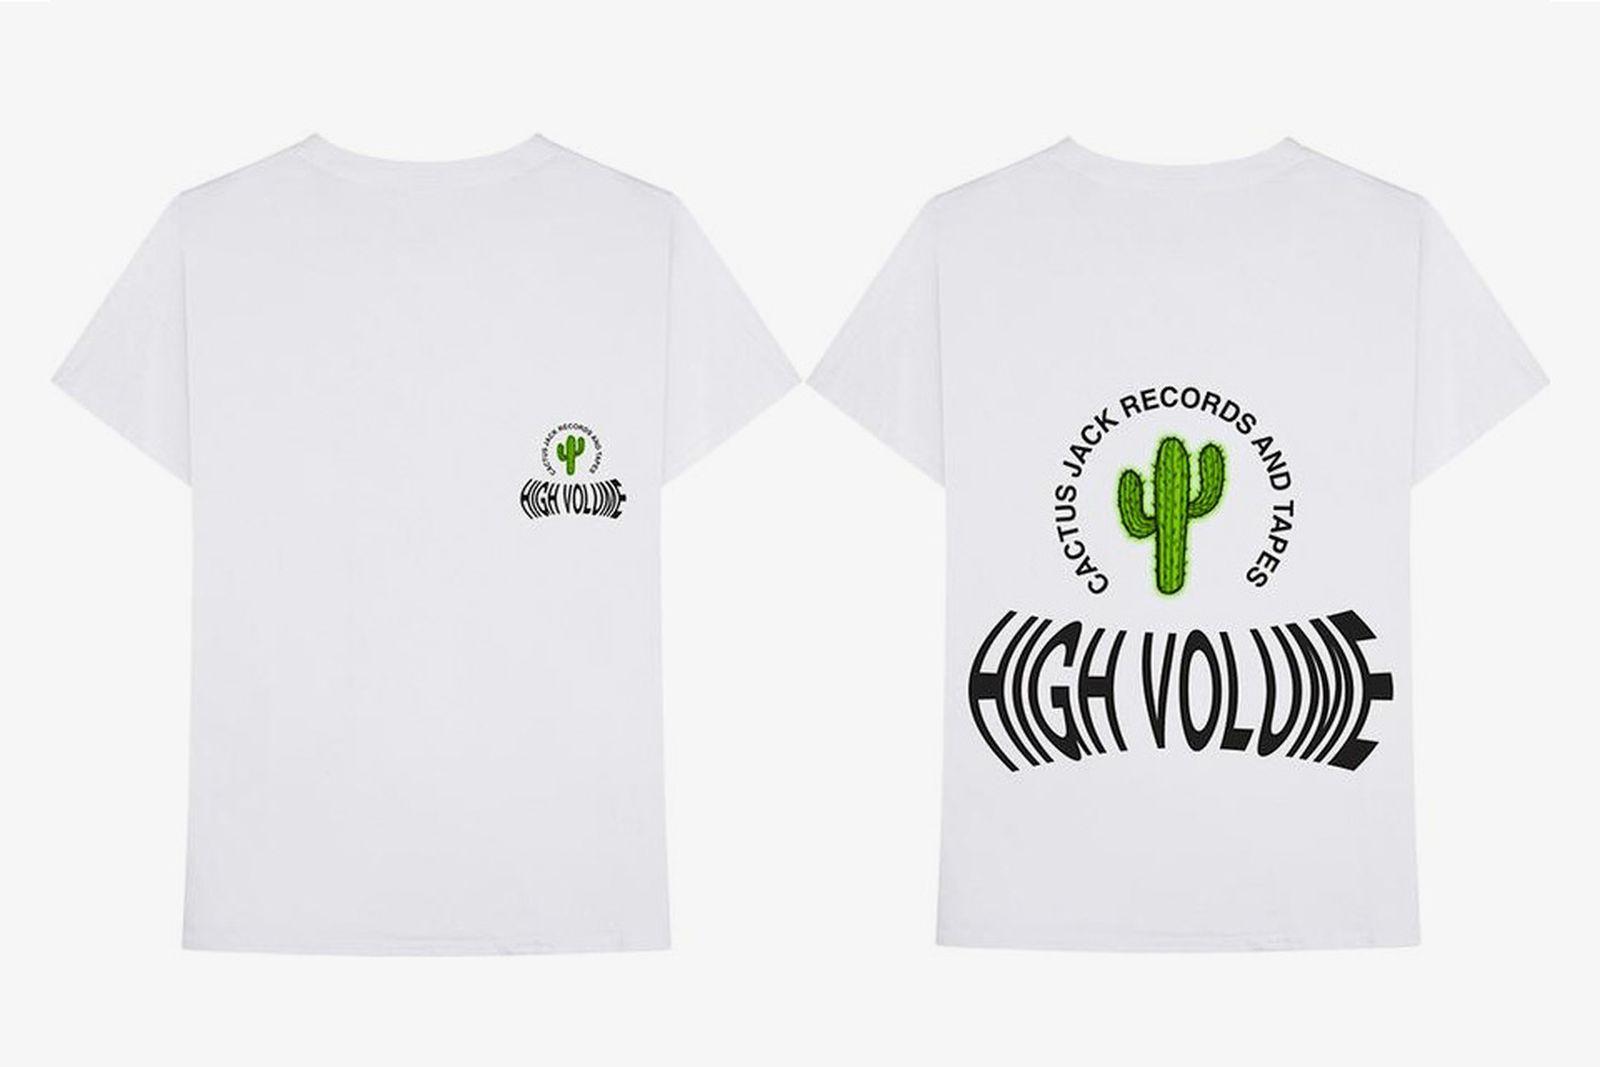 travis scott cactus jack merch ASAP Ferg Merchandise brockhampton